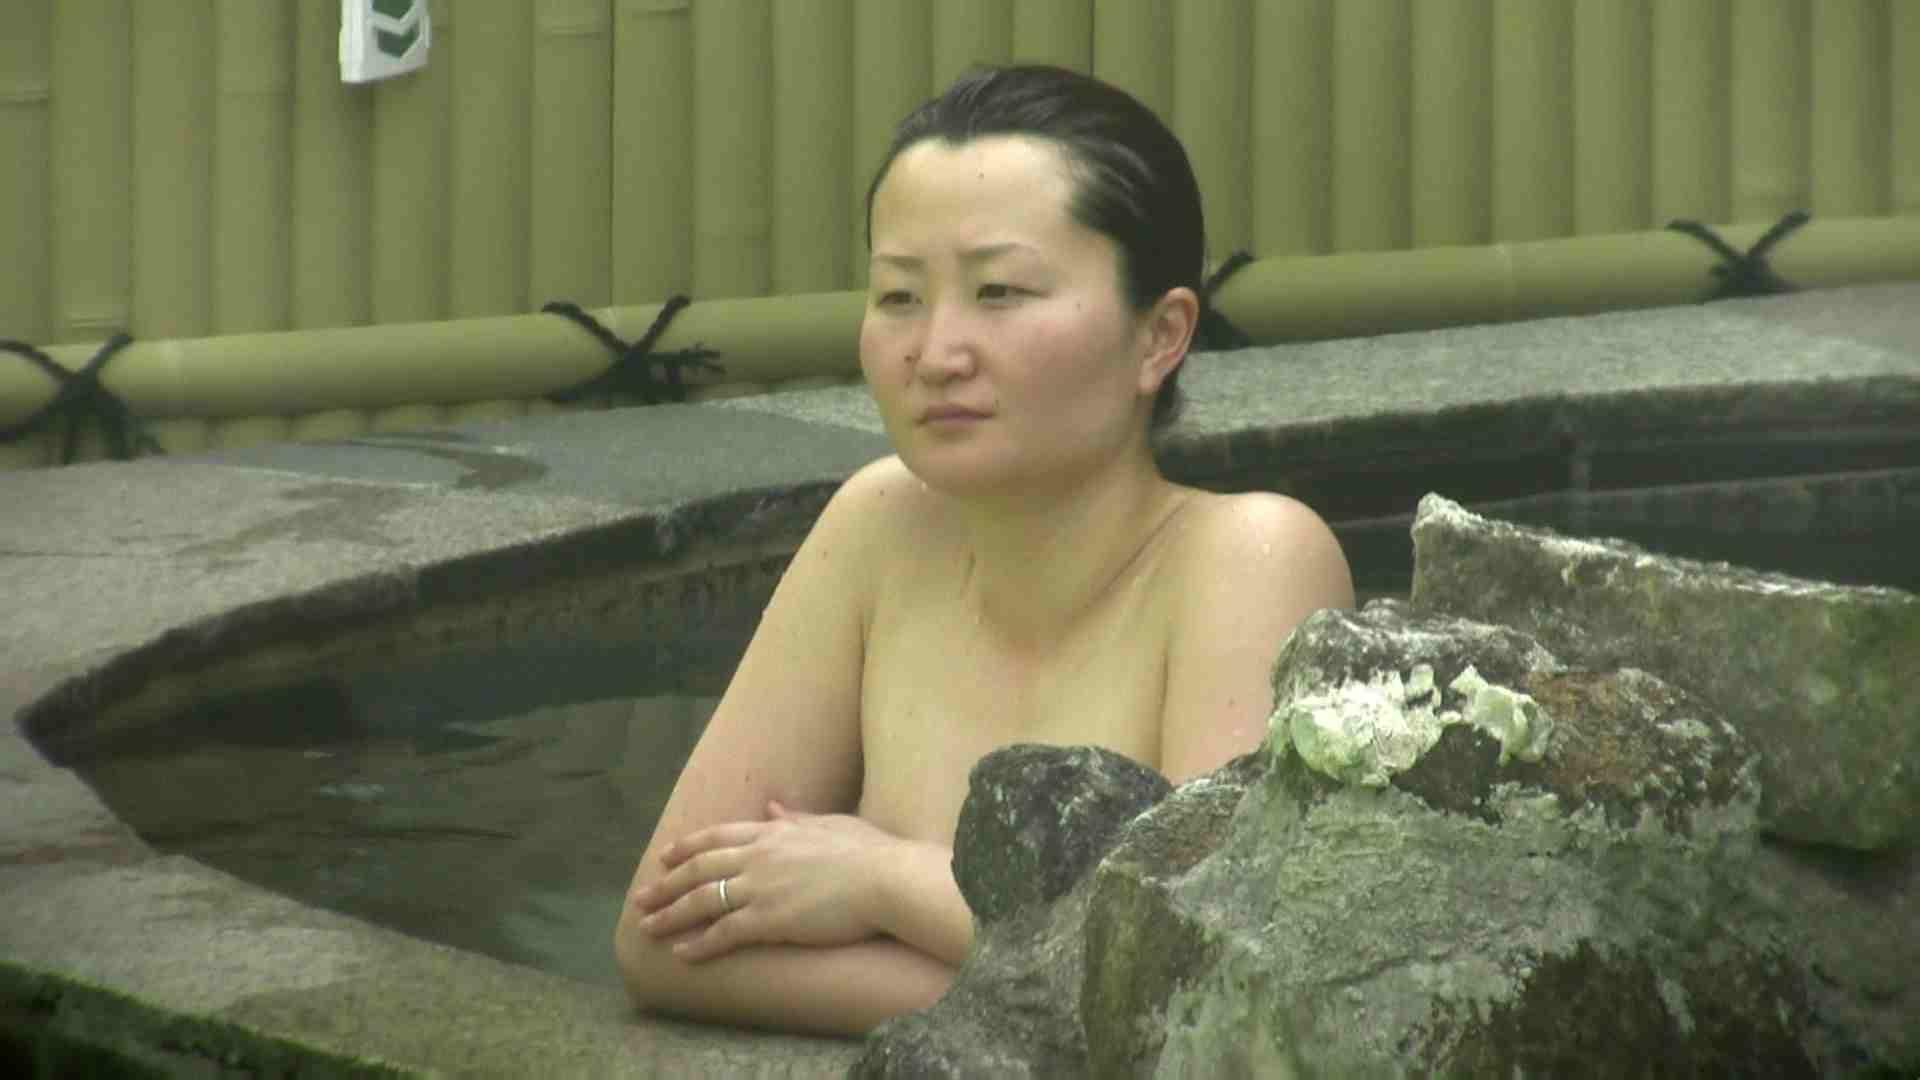 Aquaな露天風呂Vol.632 盗撮 | OLセックス  70画像 70